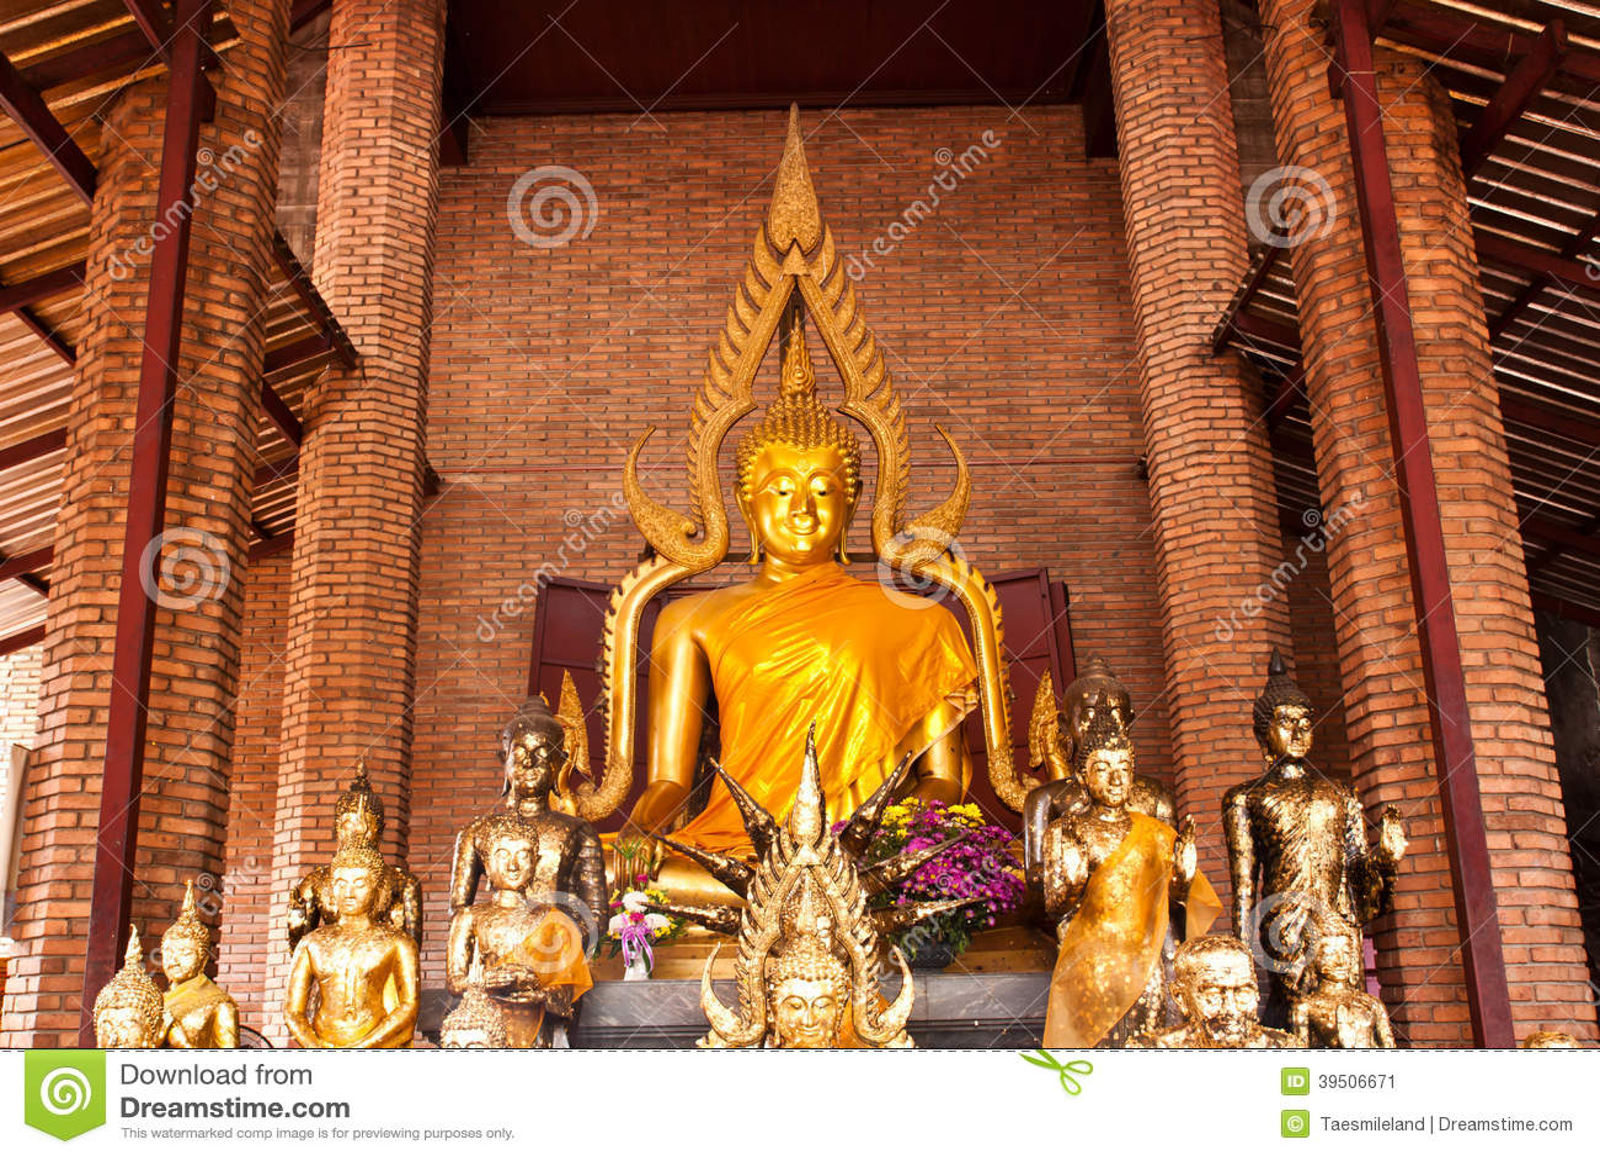 Buddha in brick church